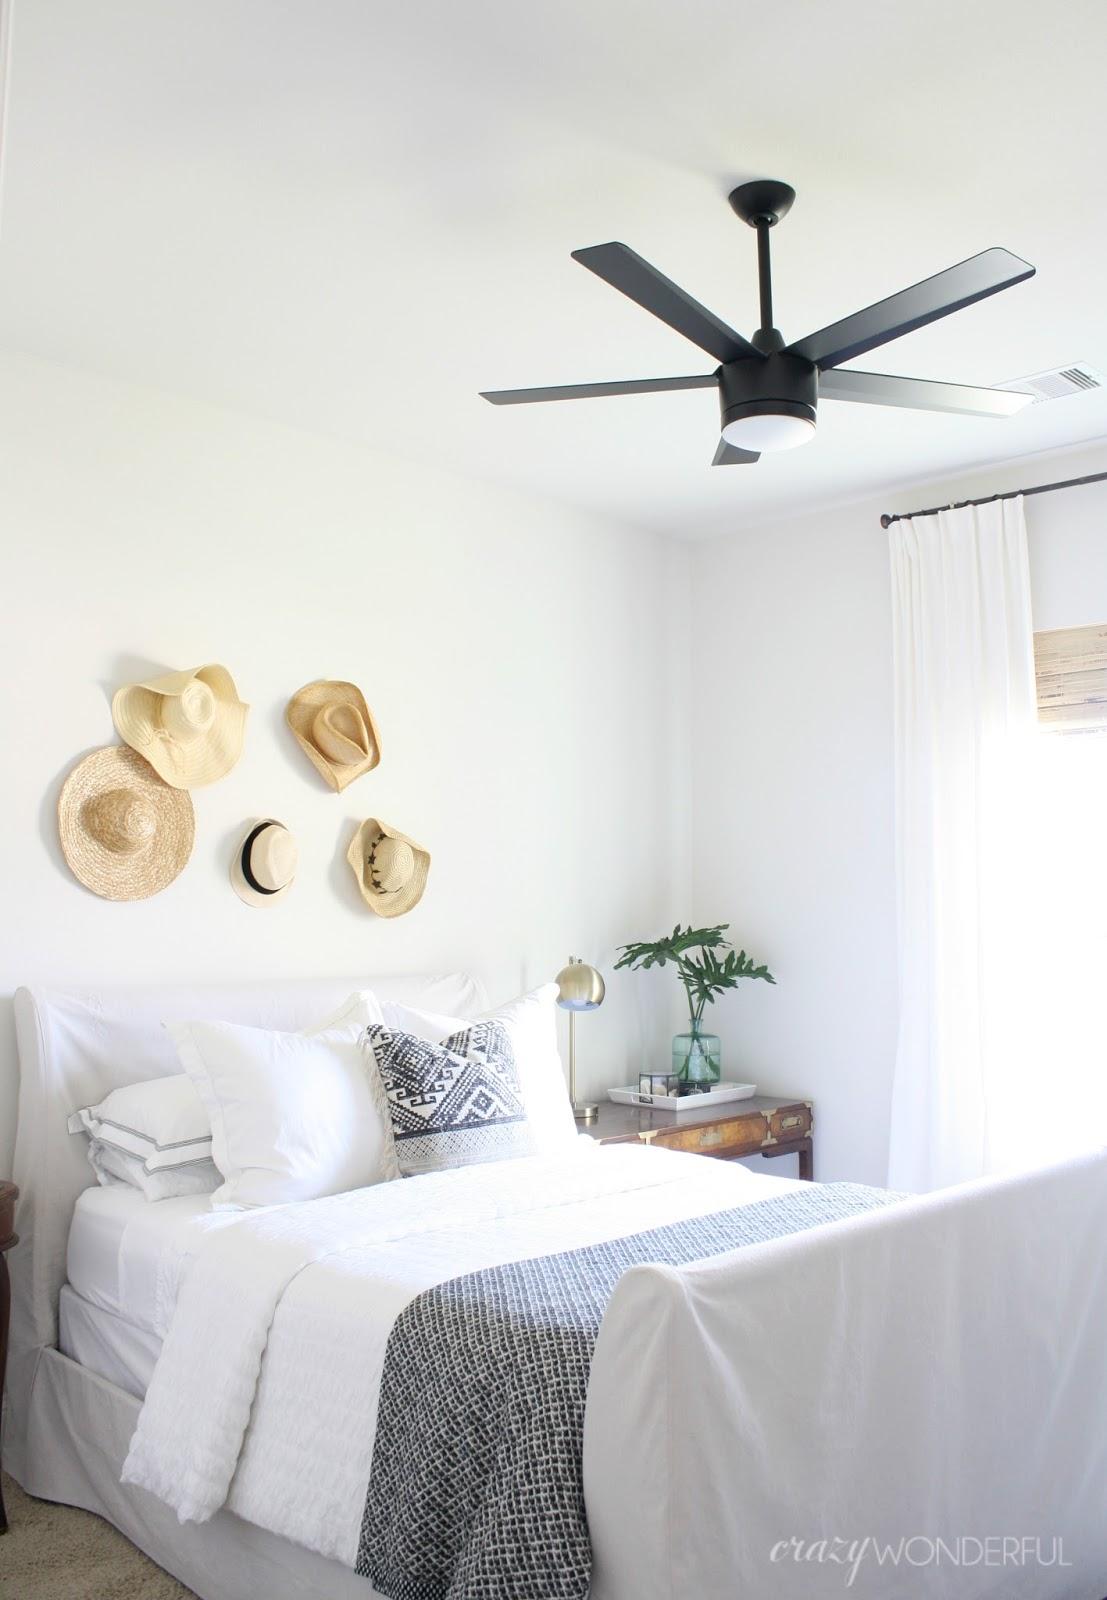 guest room ceiling fan - Crazy Wonderful